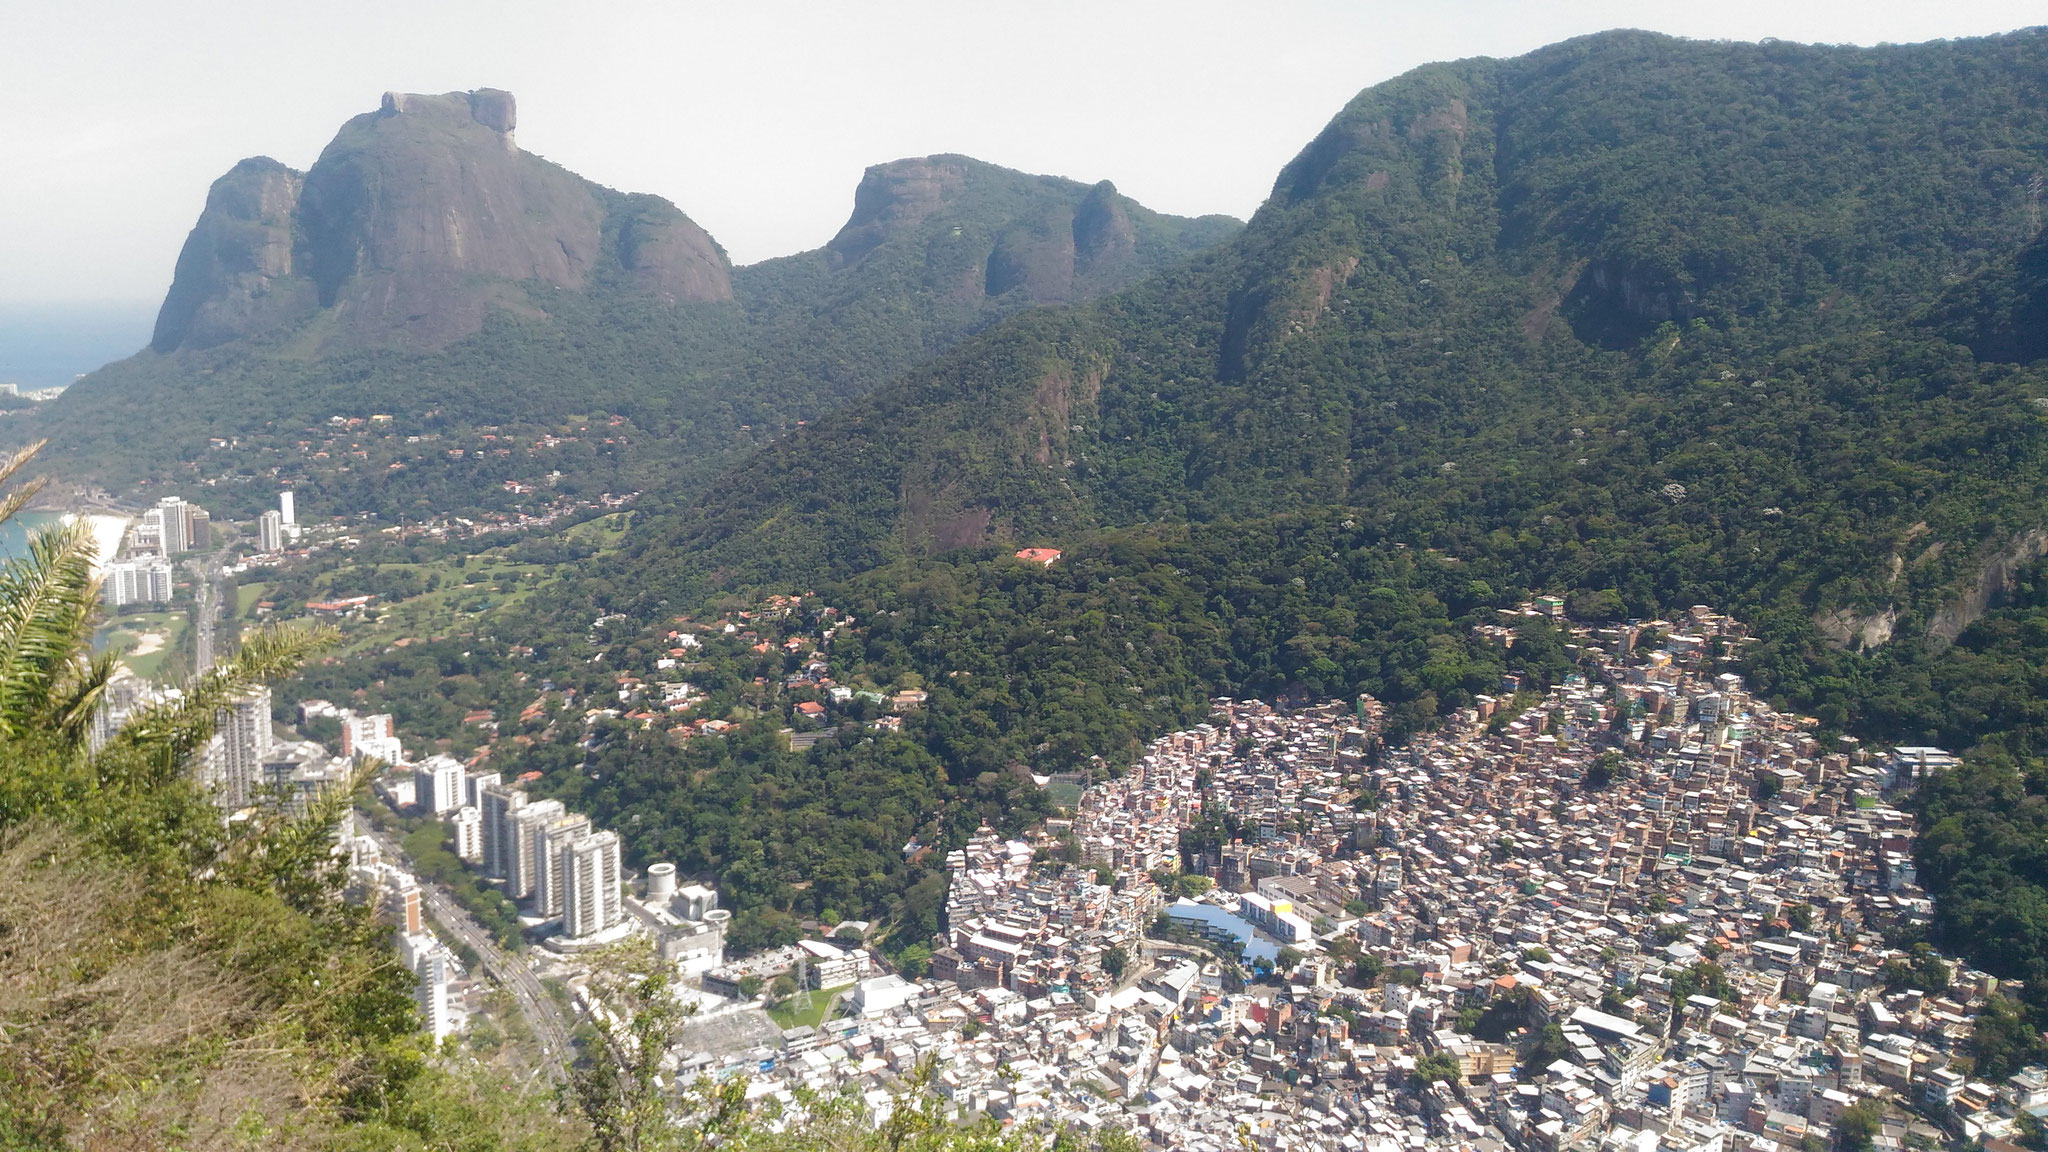 Rocinha favela is the largest of Rio : 80 000 inhabitants